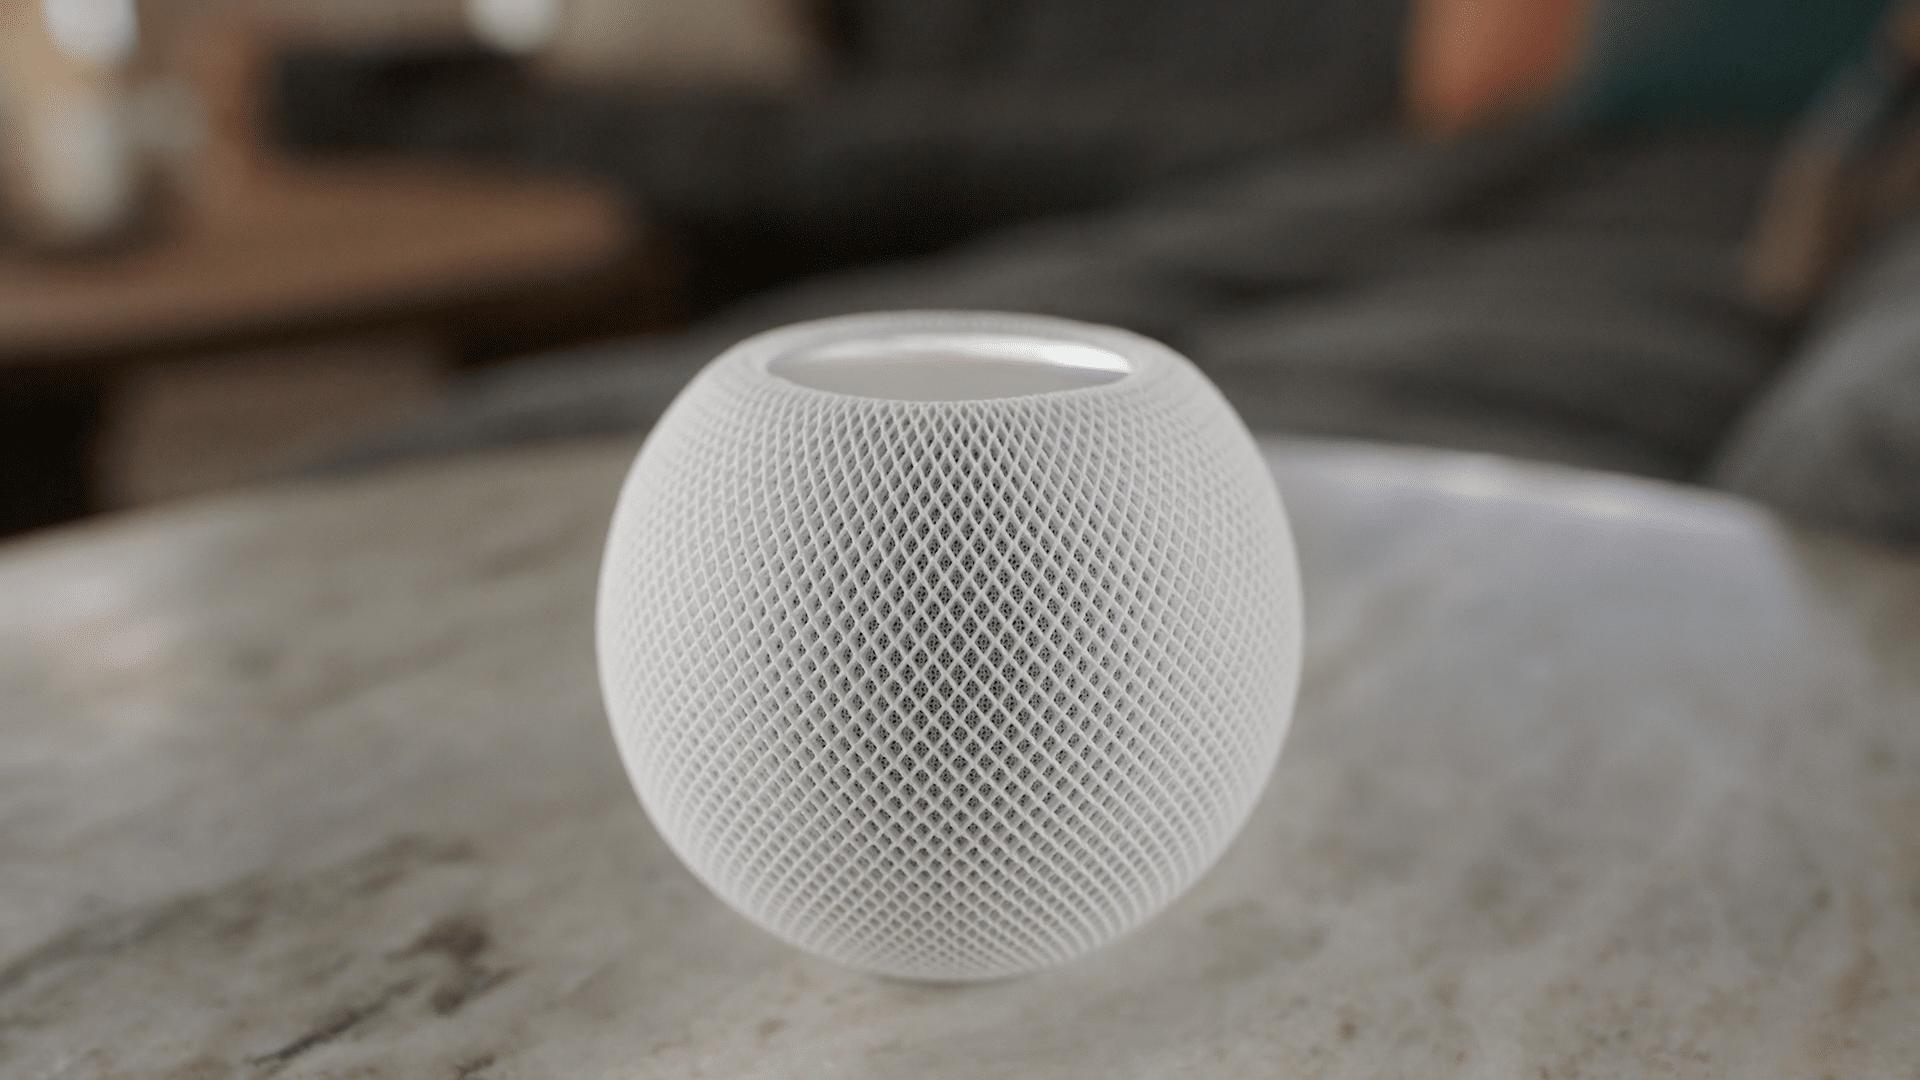 08-apple-homepod-mini-2020.png